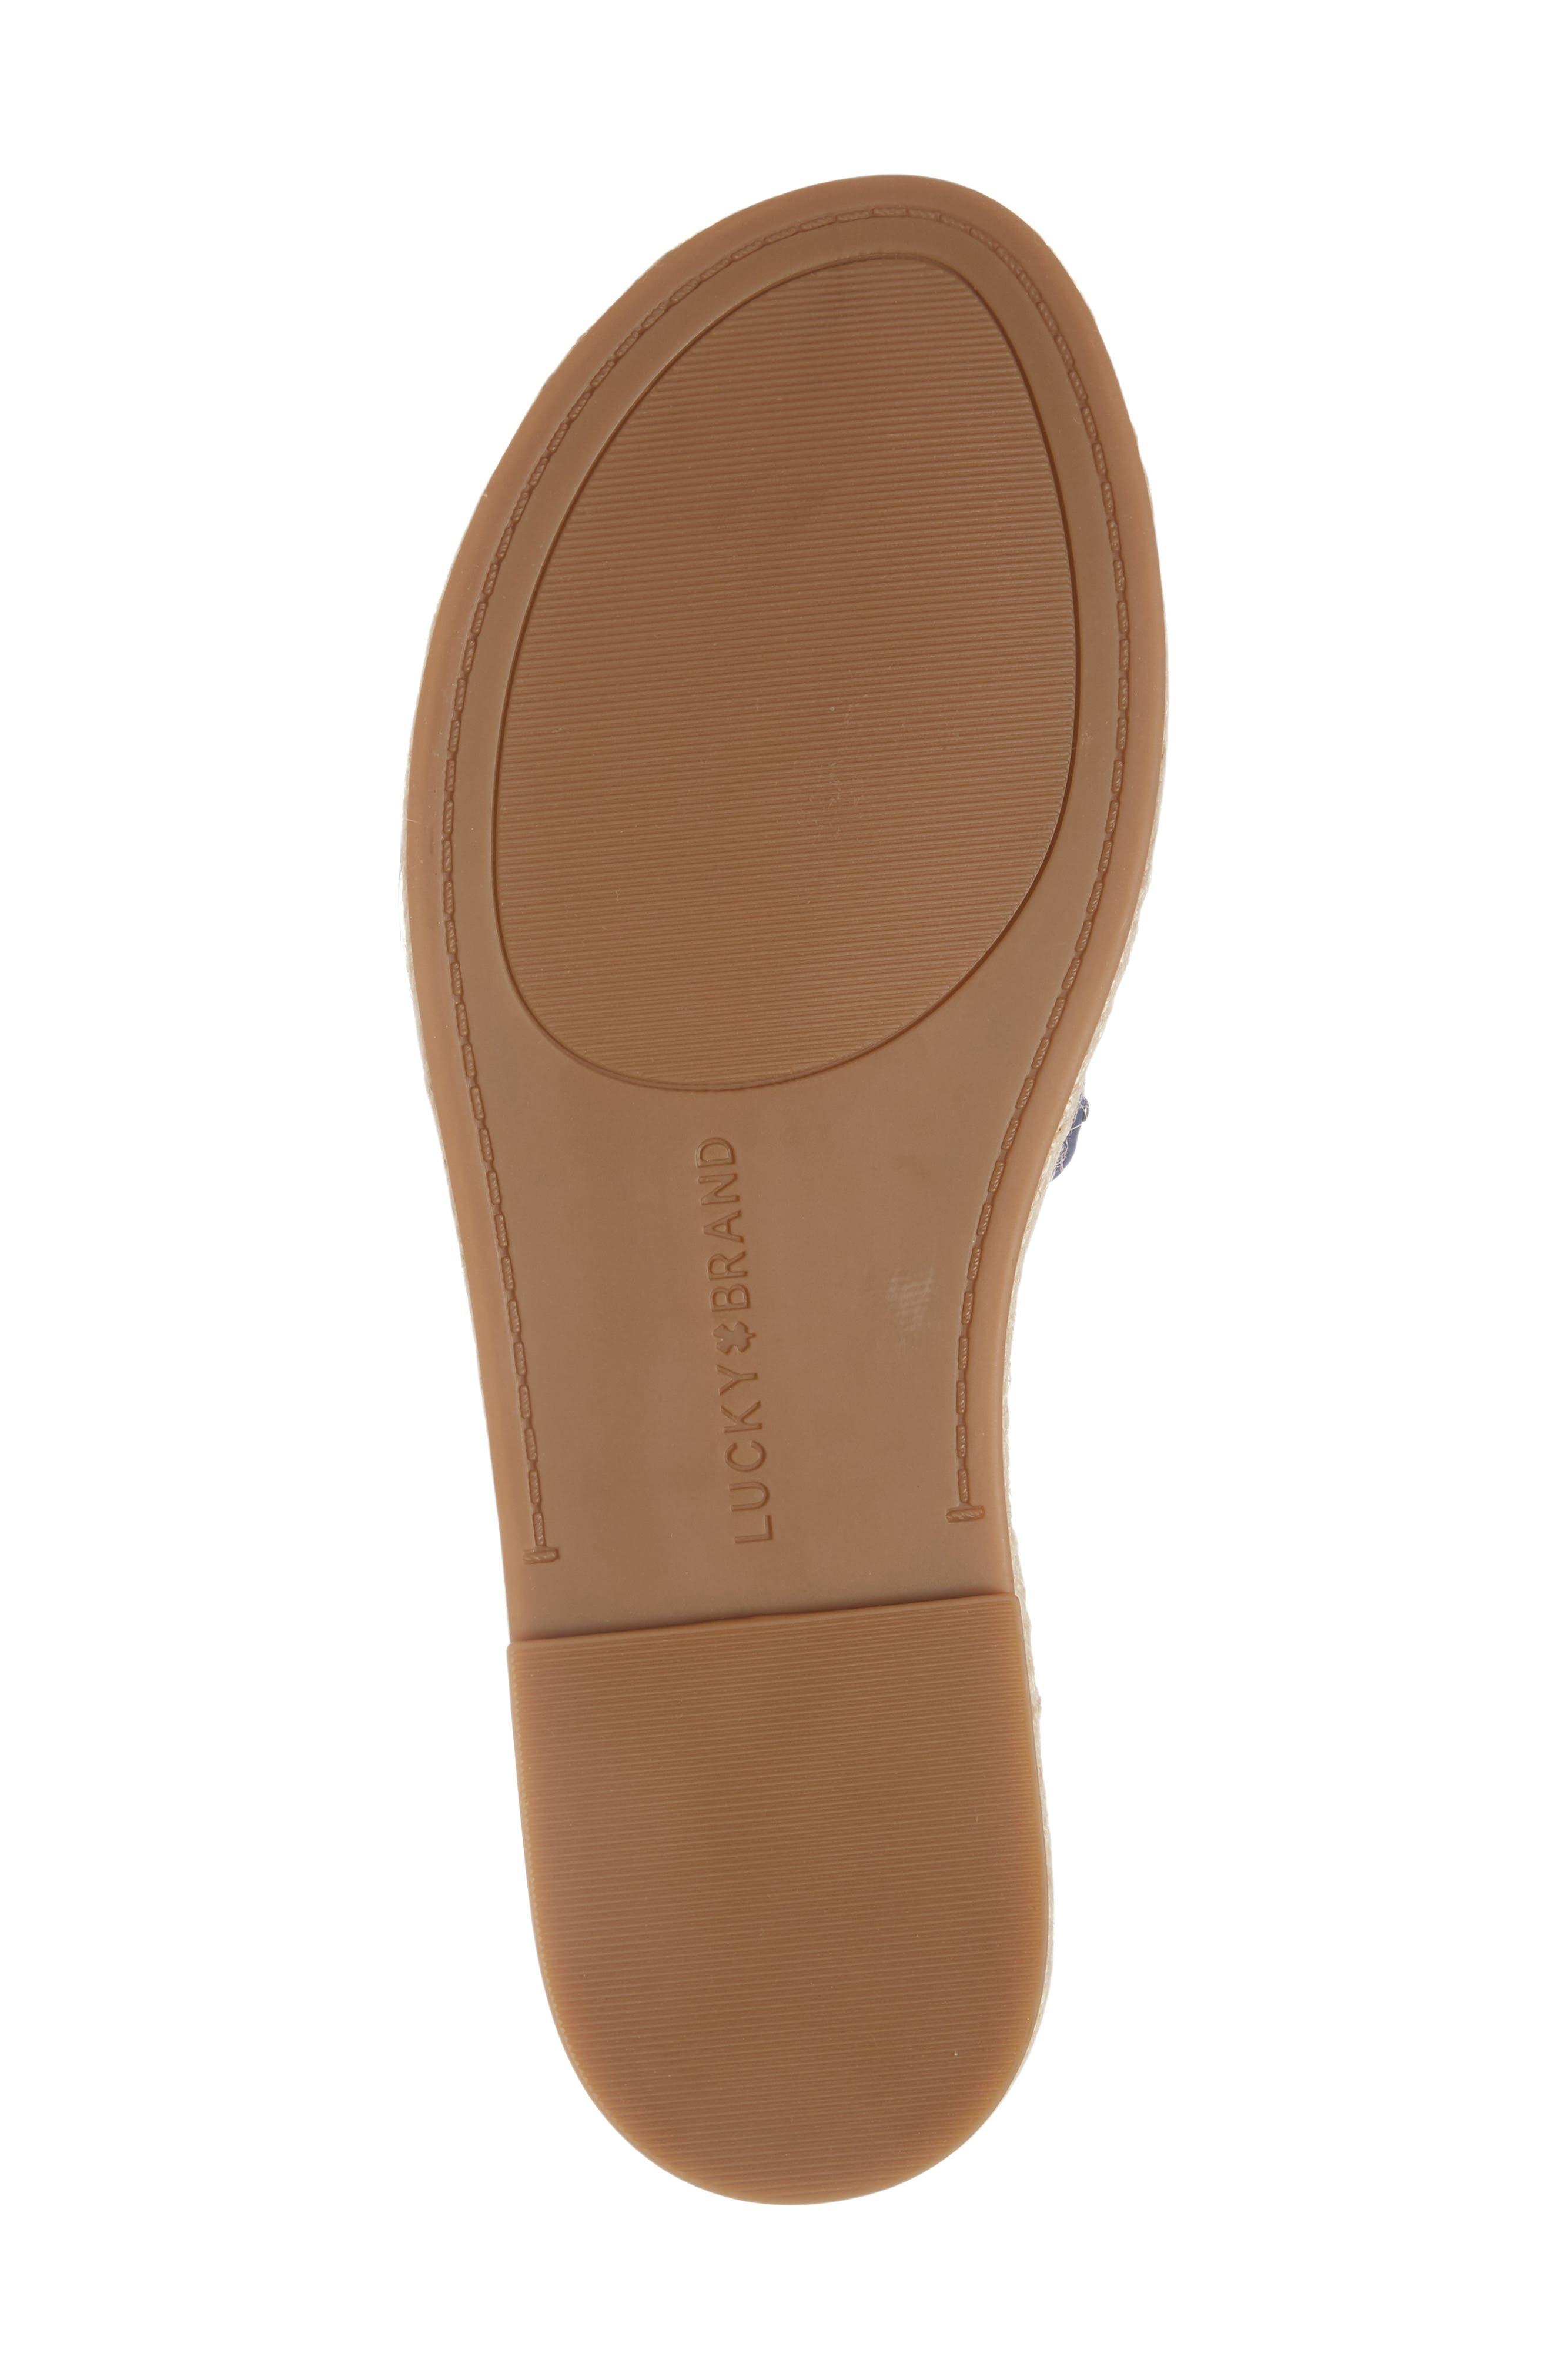 Daytah Ankle Tie Sandal,                             Alternate thumbnail 5, color,                             Dark Chambray